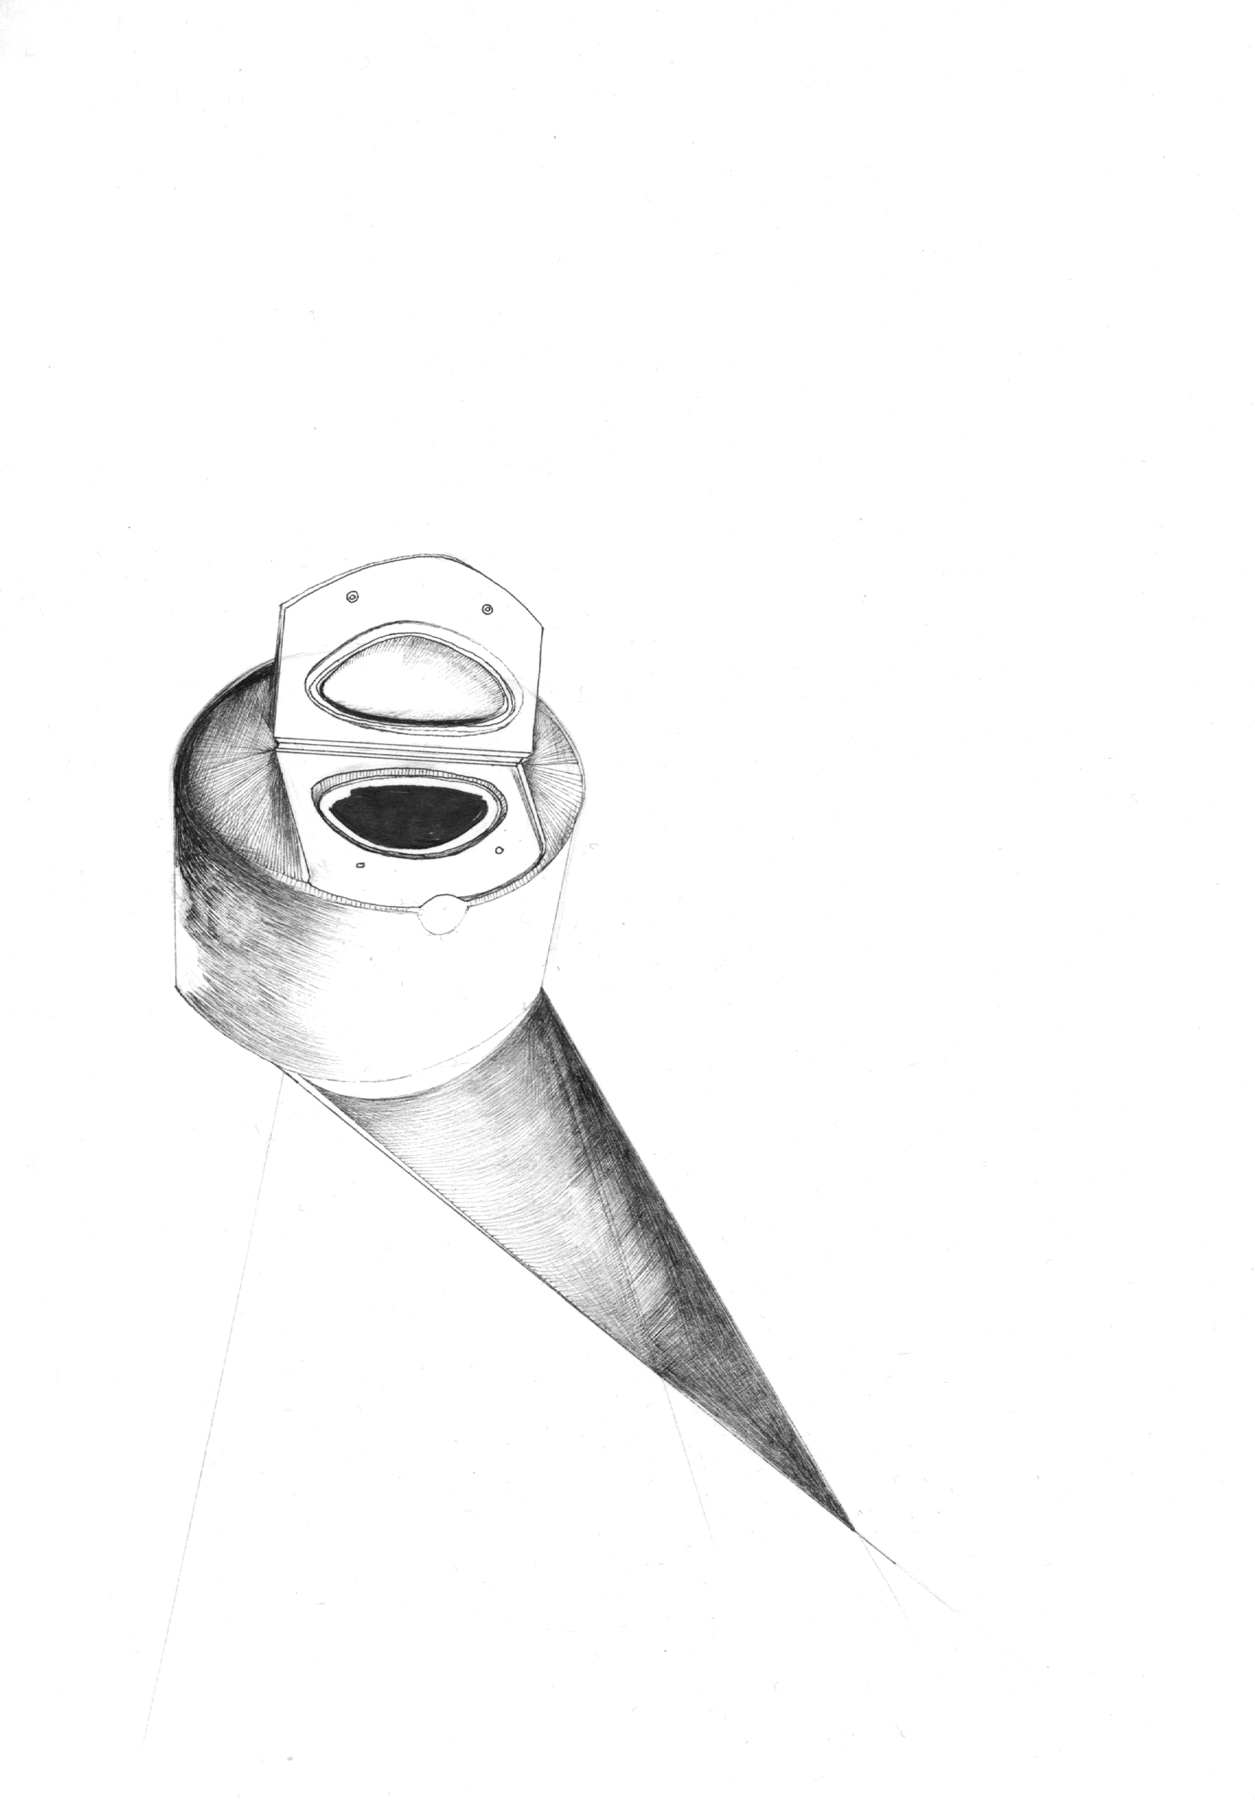 Nina Annabelle Märkl | Fragments II | ink on paper | 21 x 15 cm